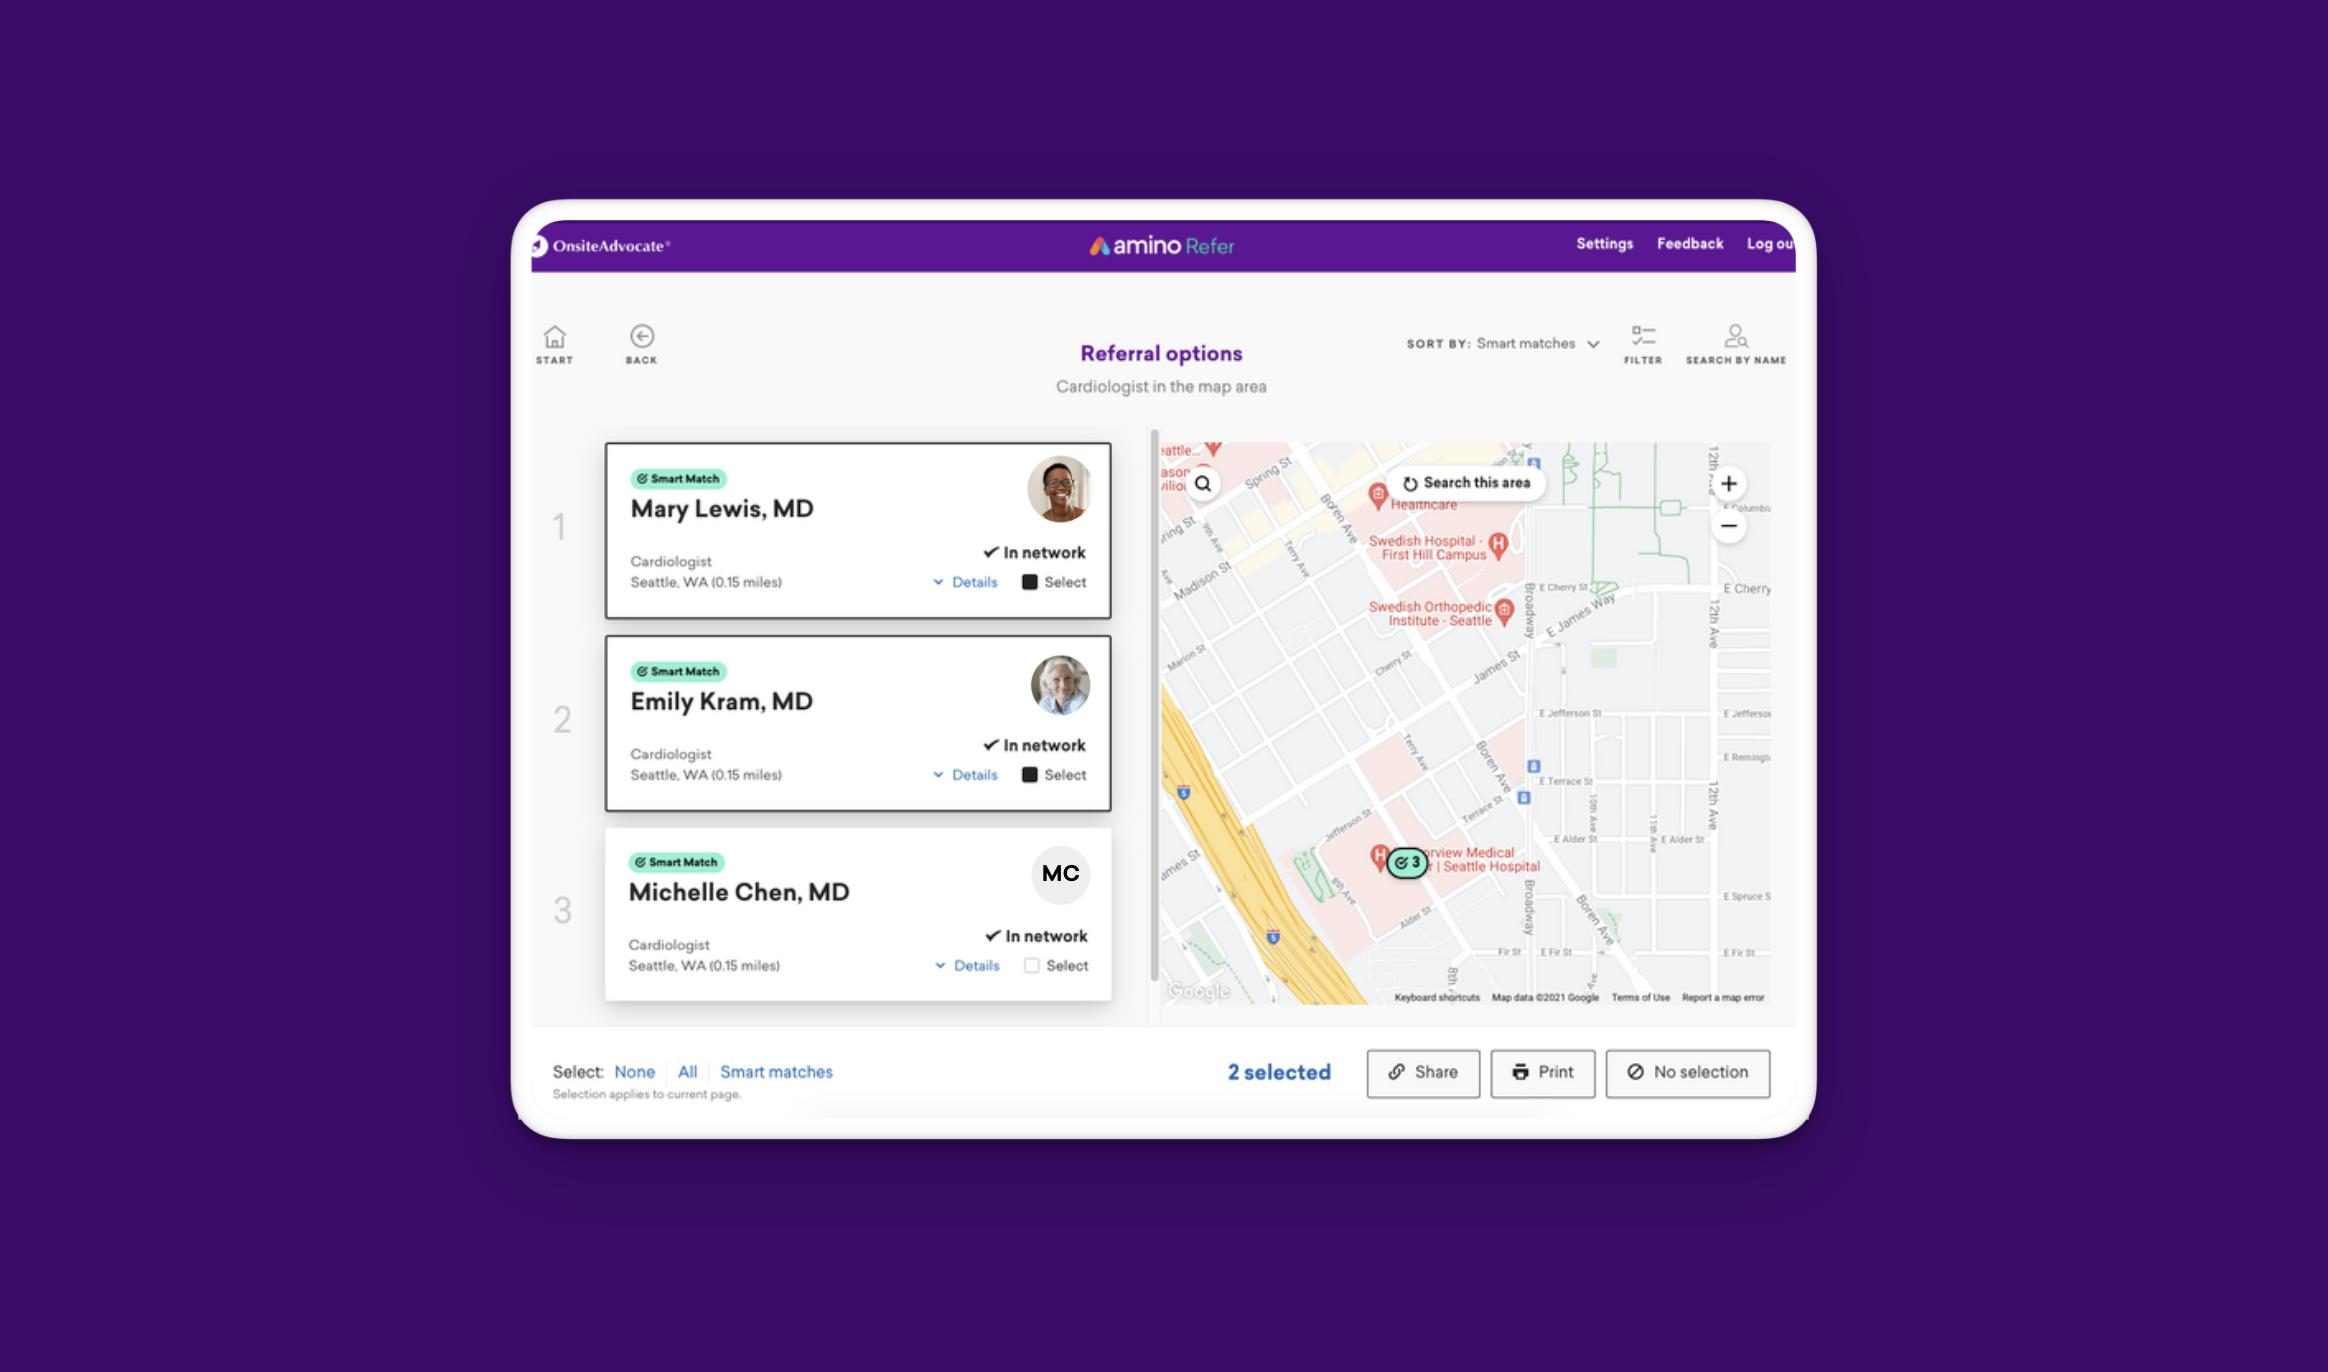 Screenshot shows new multi-select interface